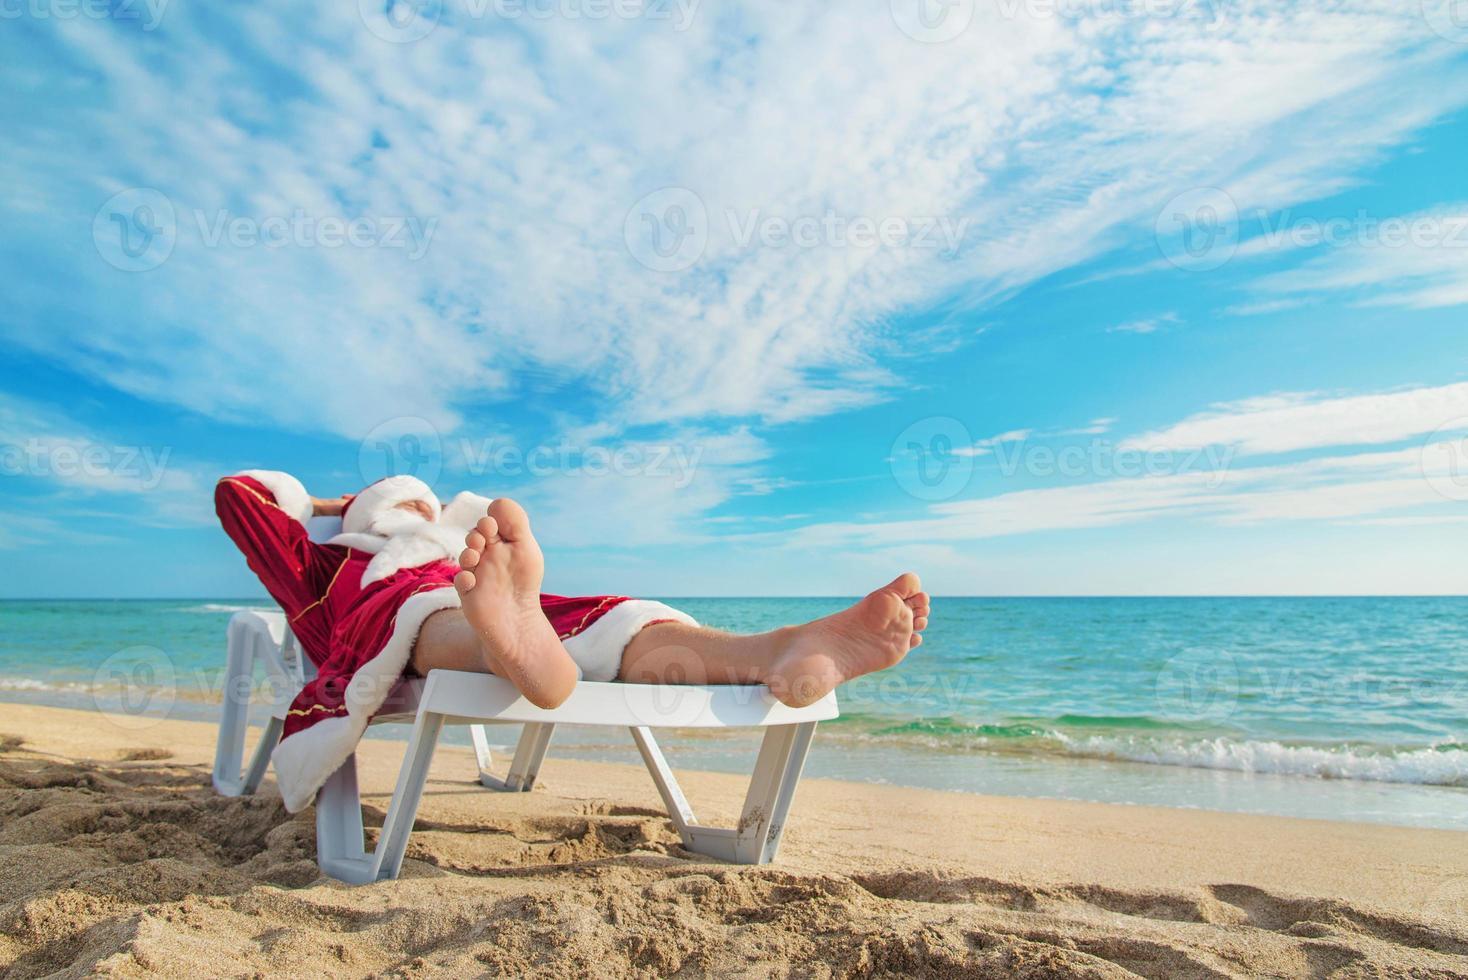 sunbathing Santa Claus relaxing on tropical sandy beach photo